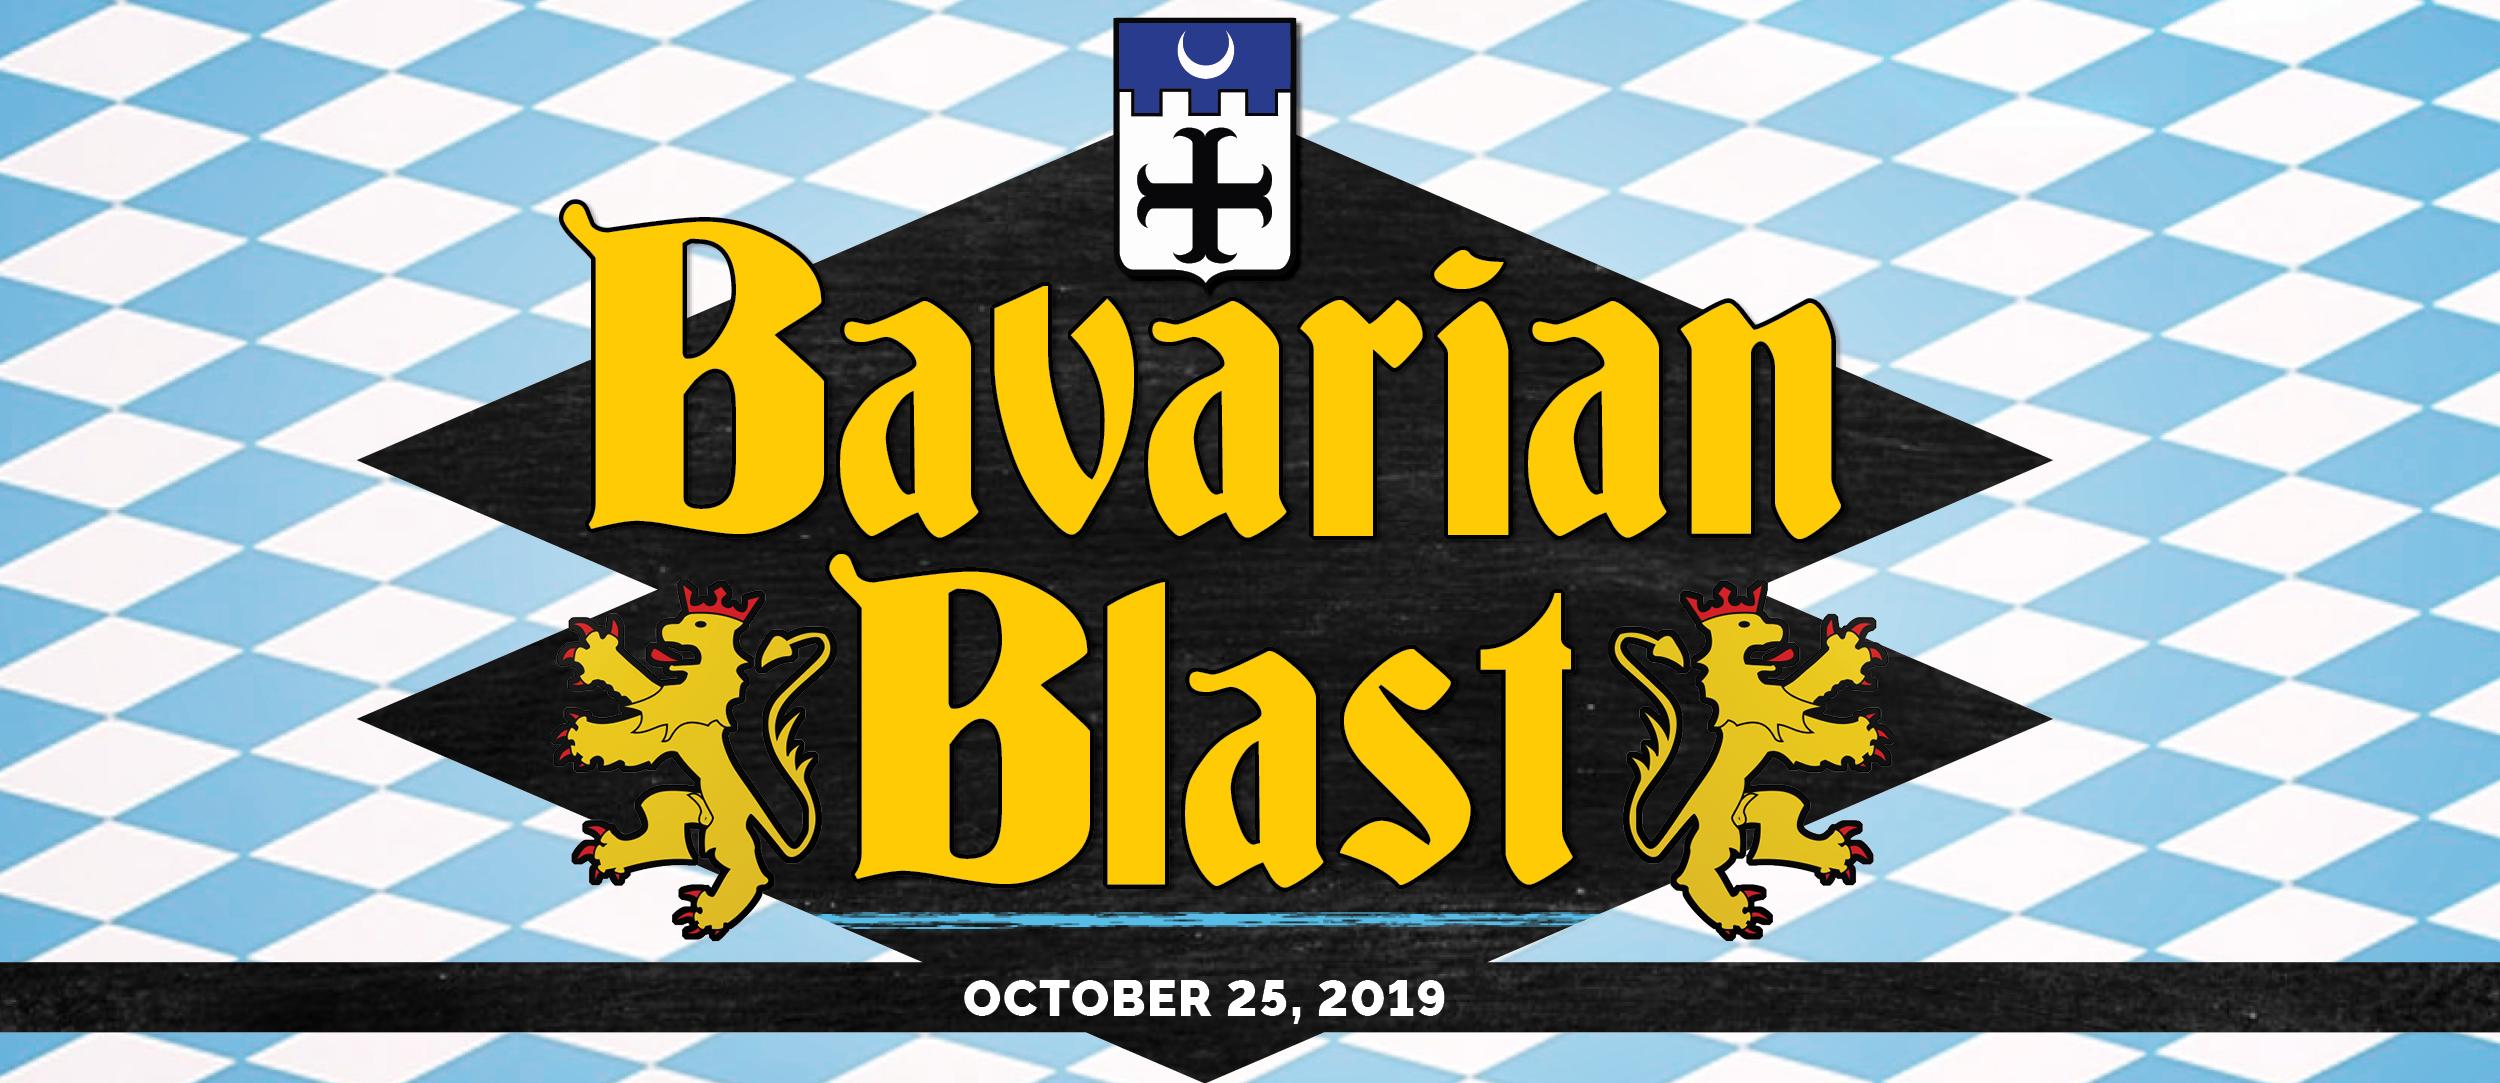 BavarianBlast_Wide.jpg